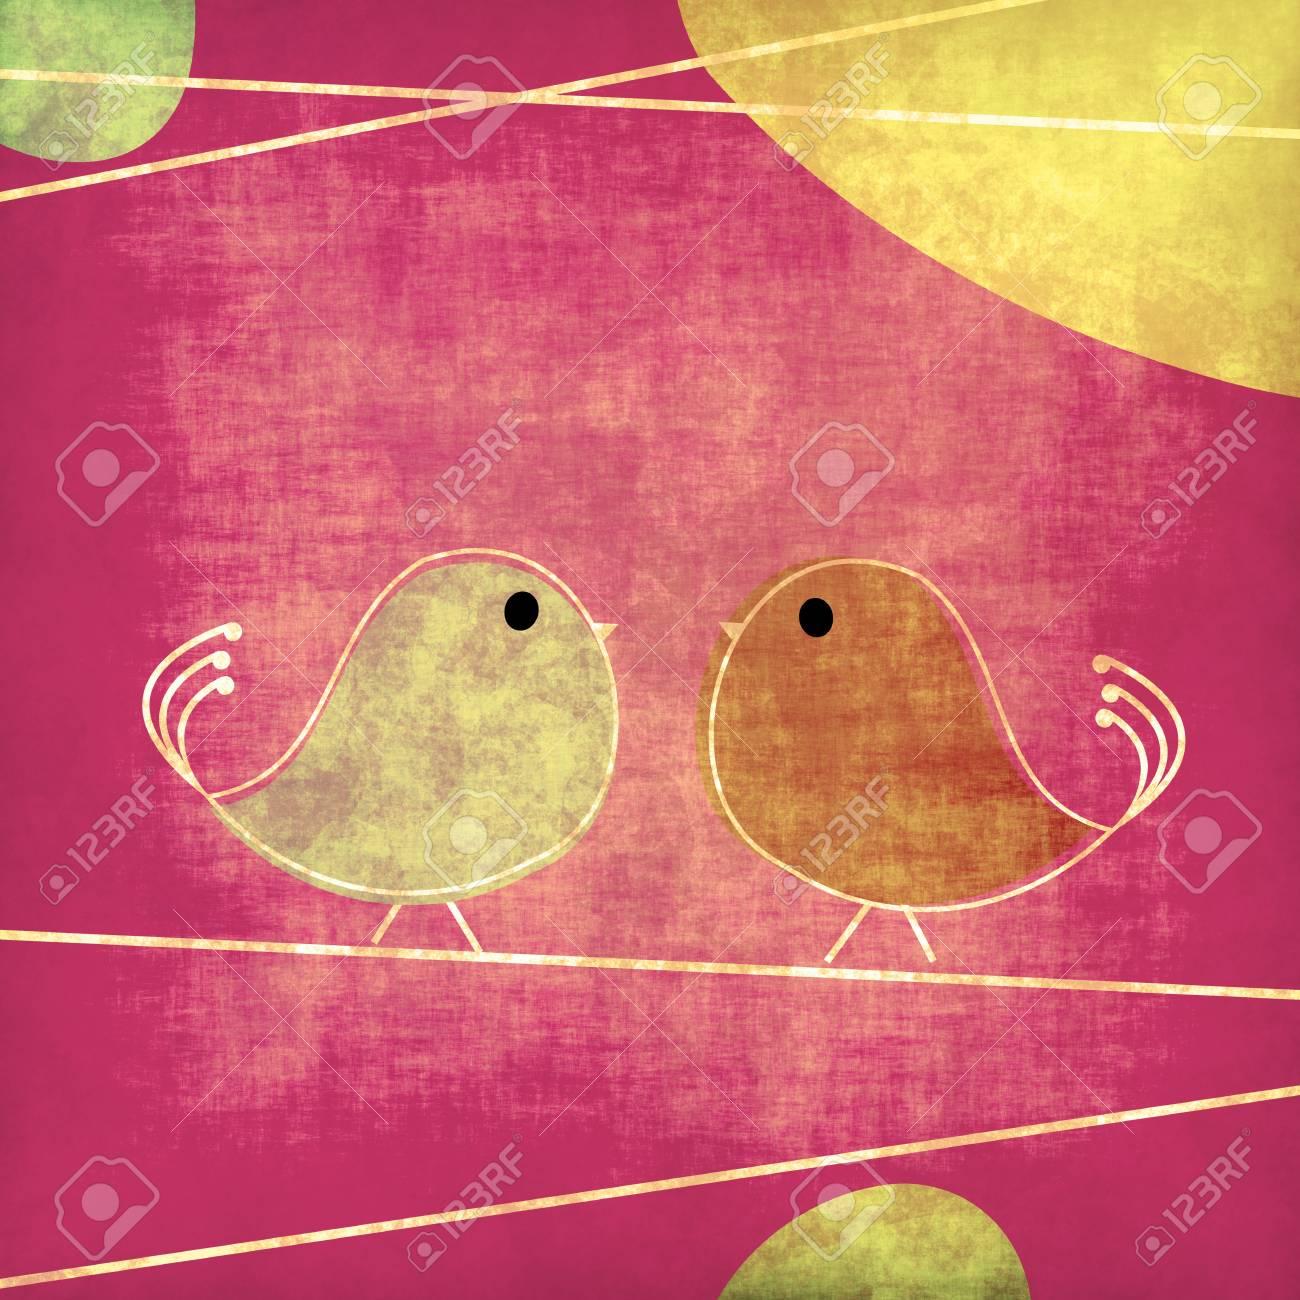 Tweet birds grunge background illustration Stock Illustration - 8486295